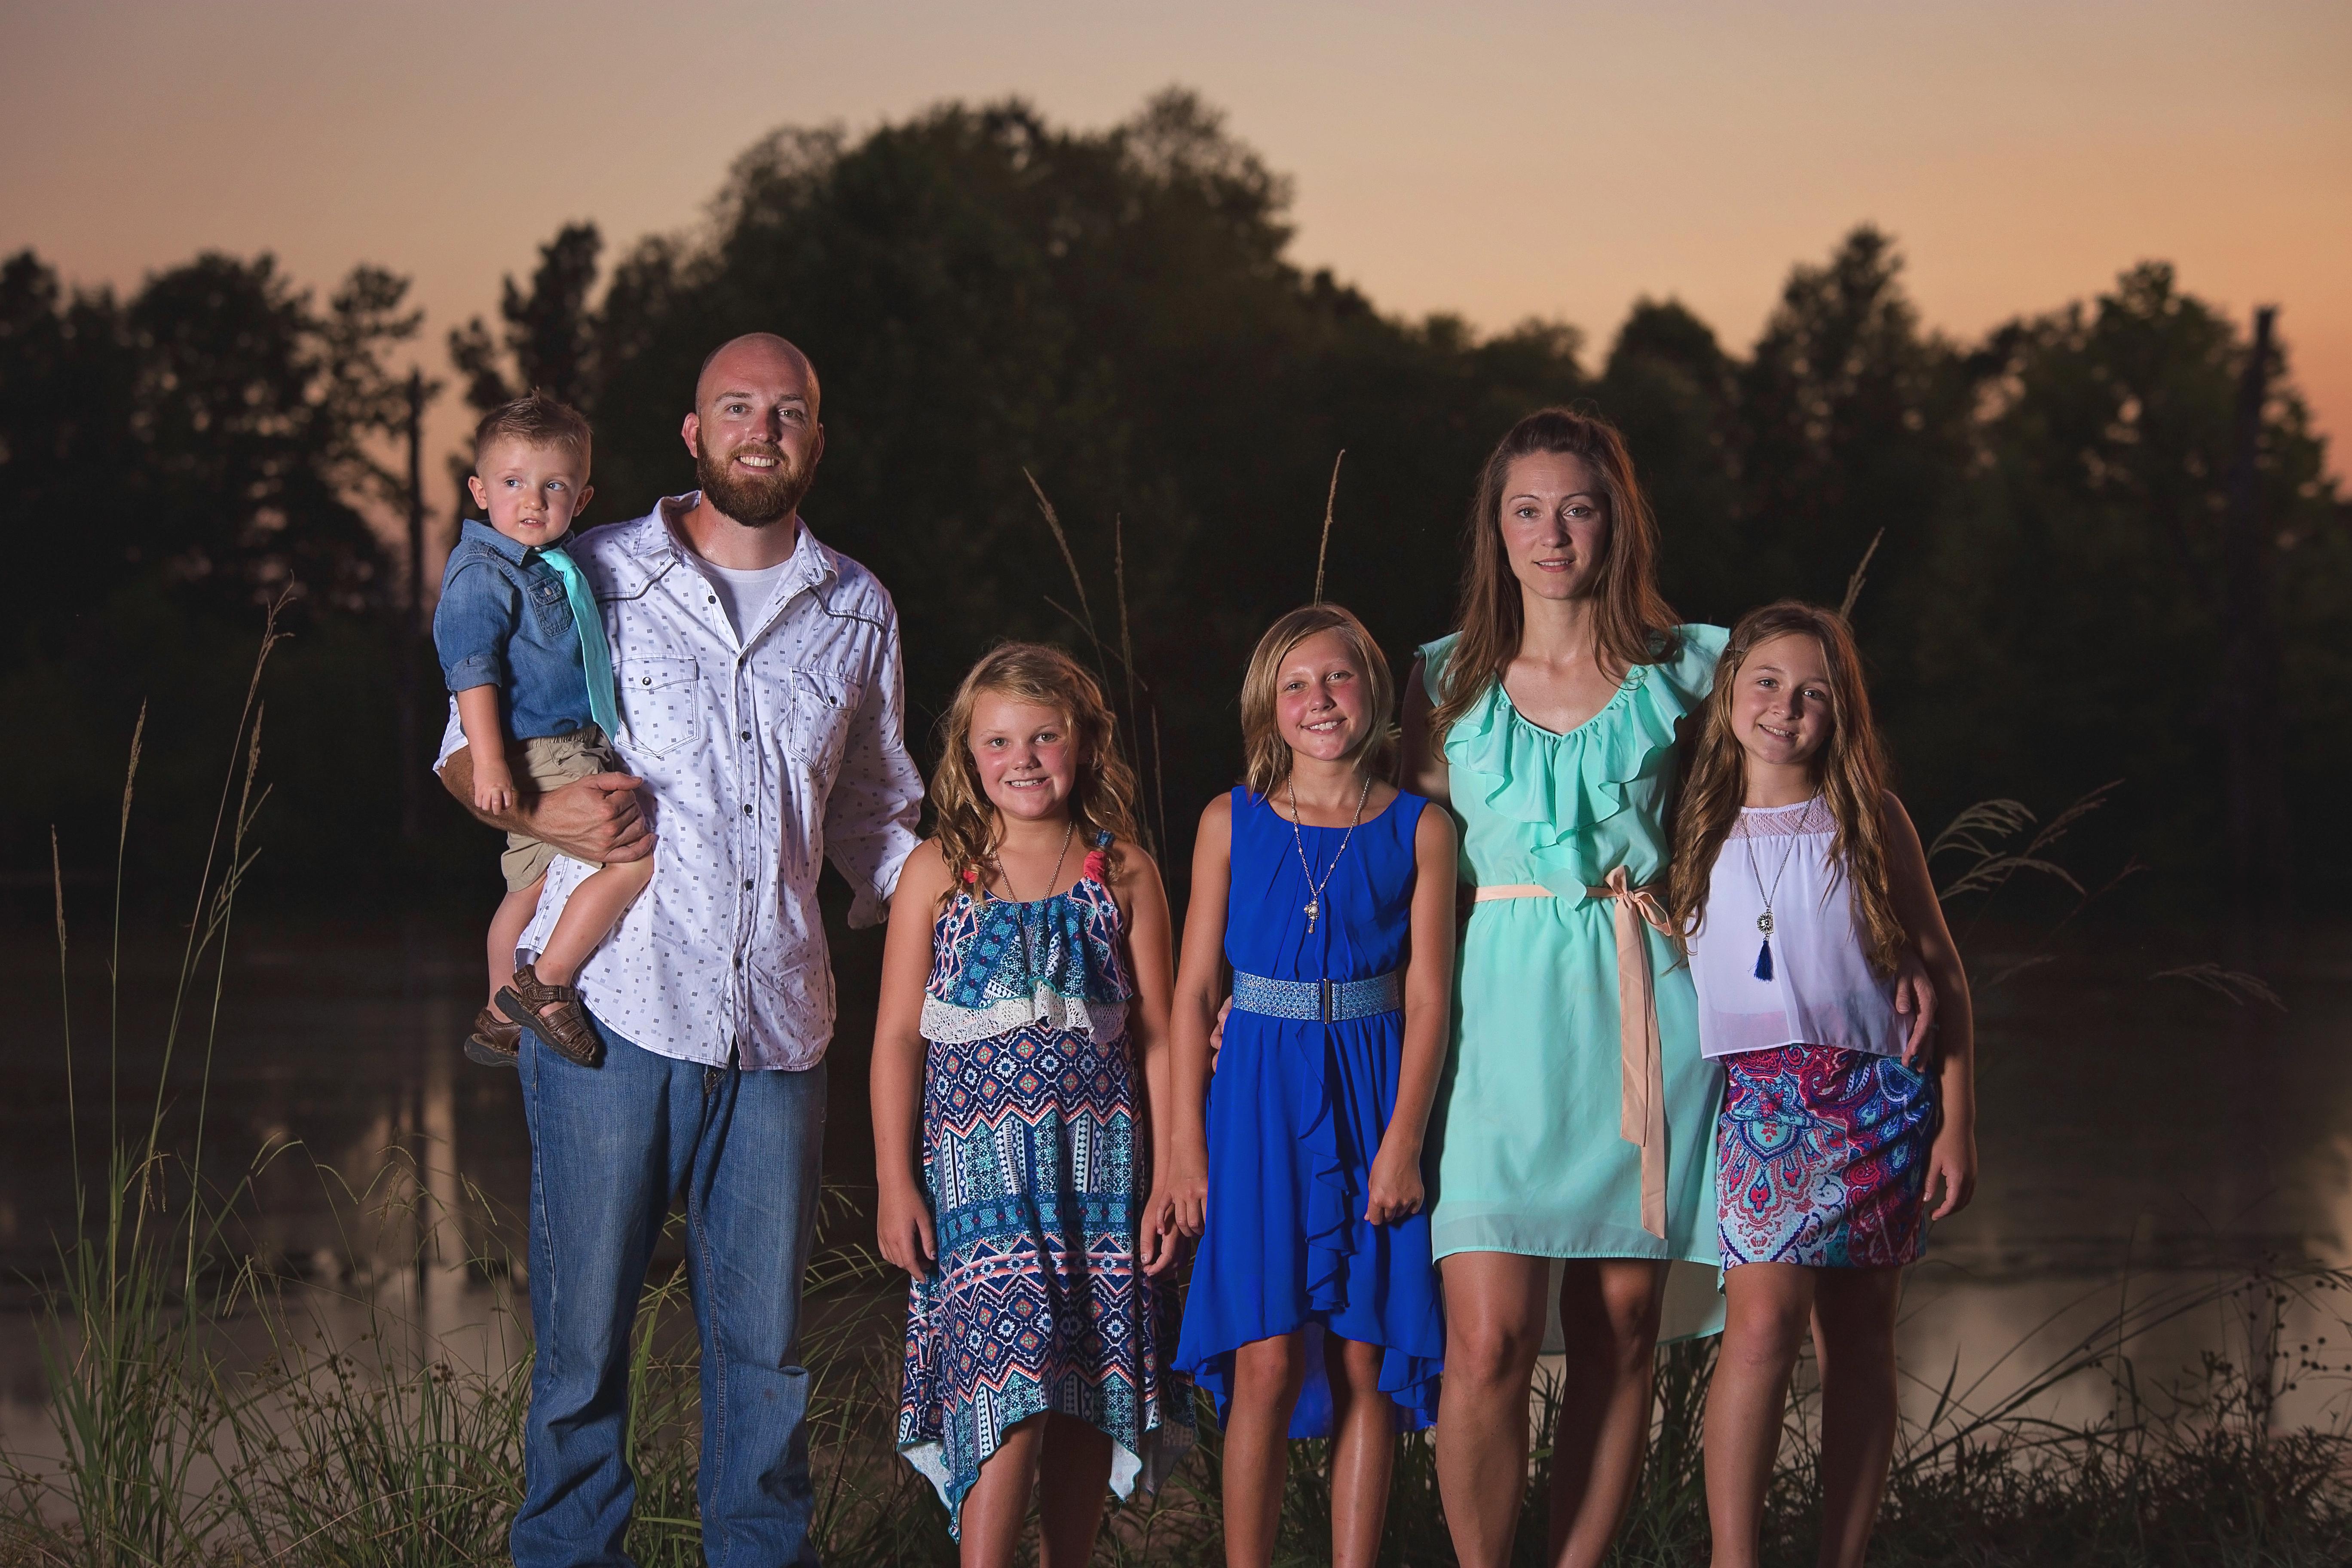 Outdoor Sunset Family Photography Texarkana, Texas